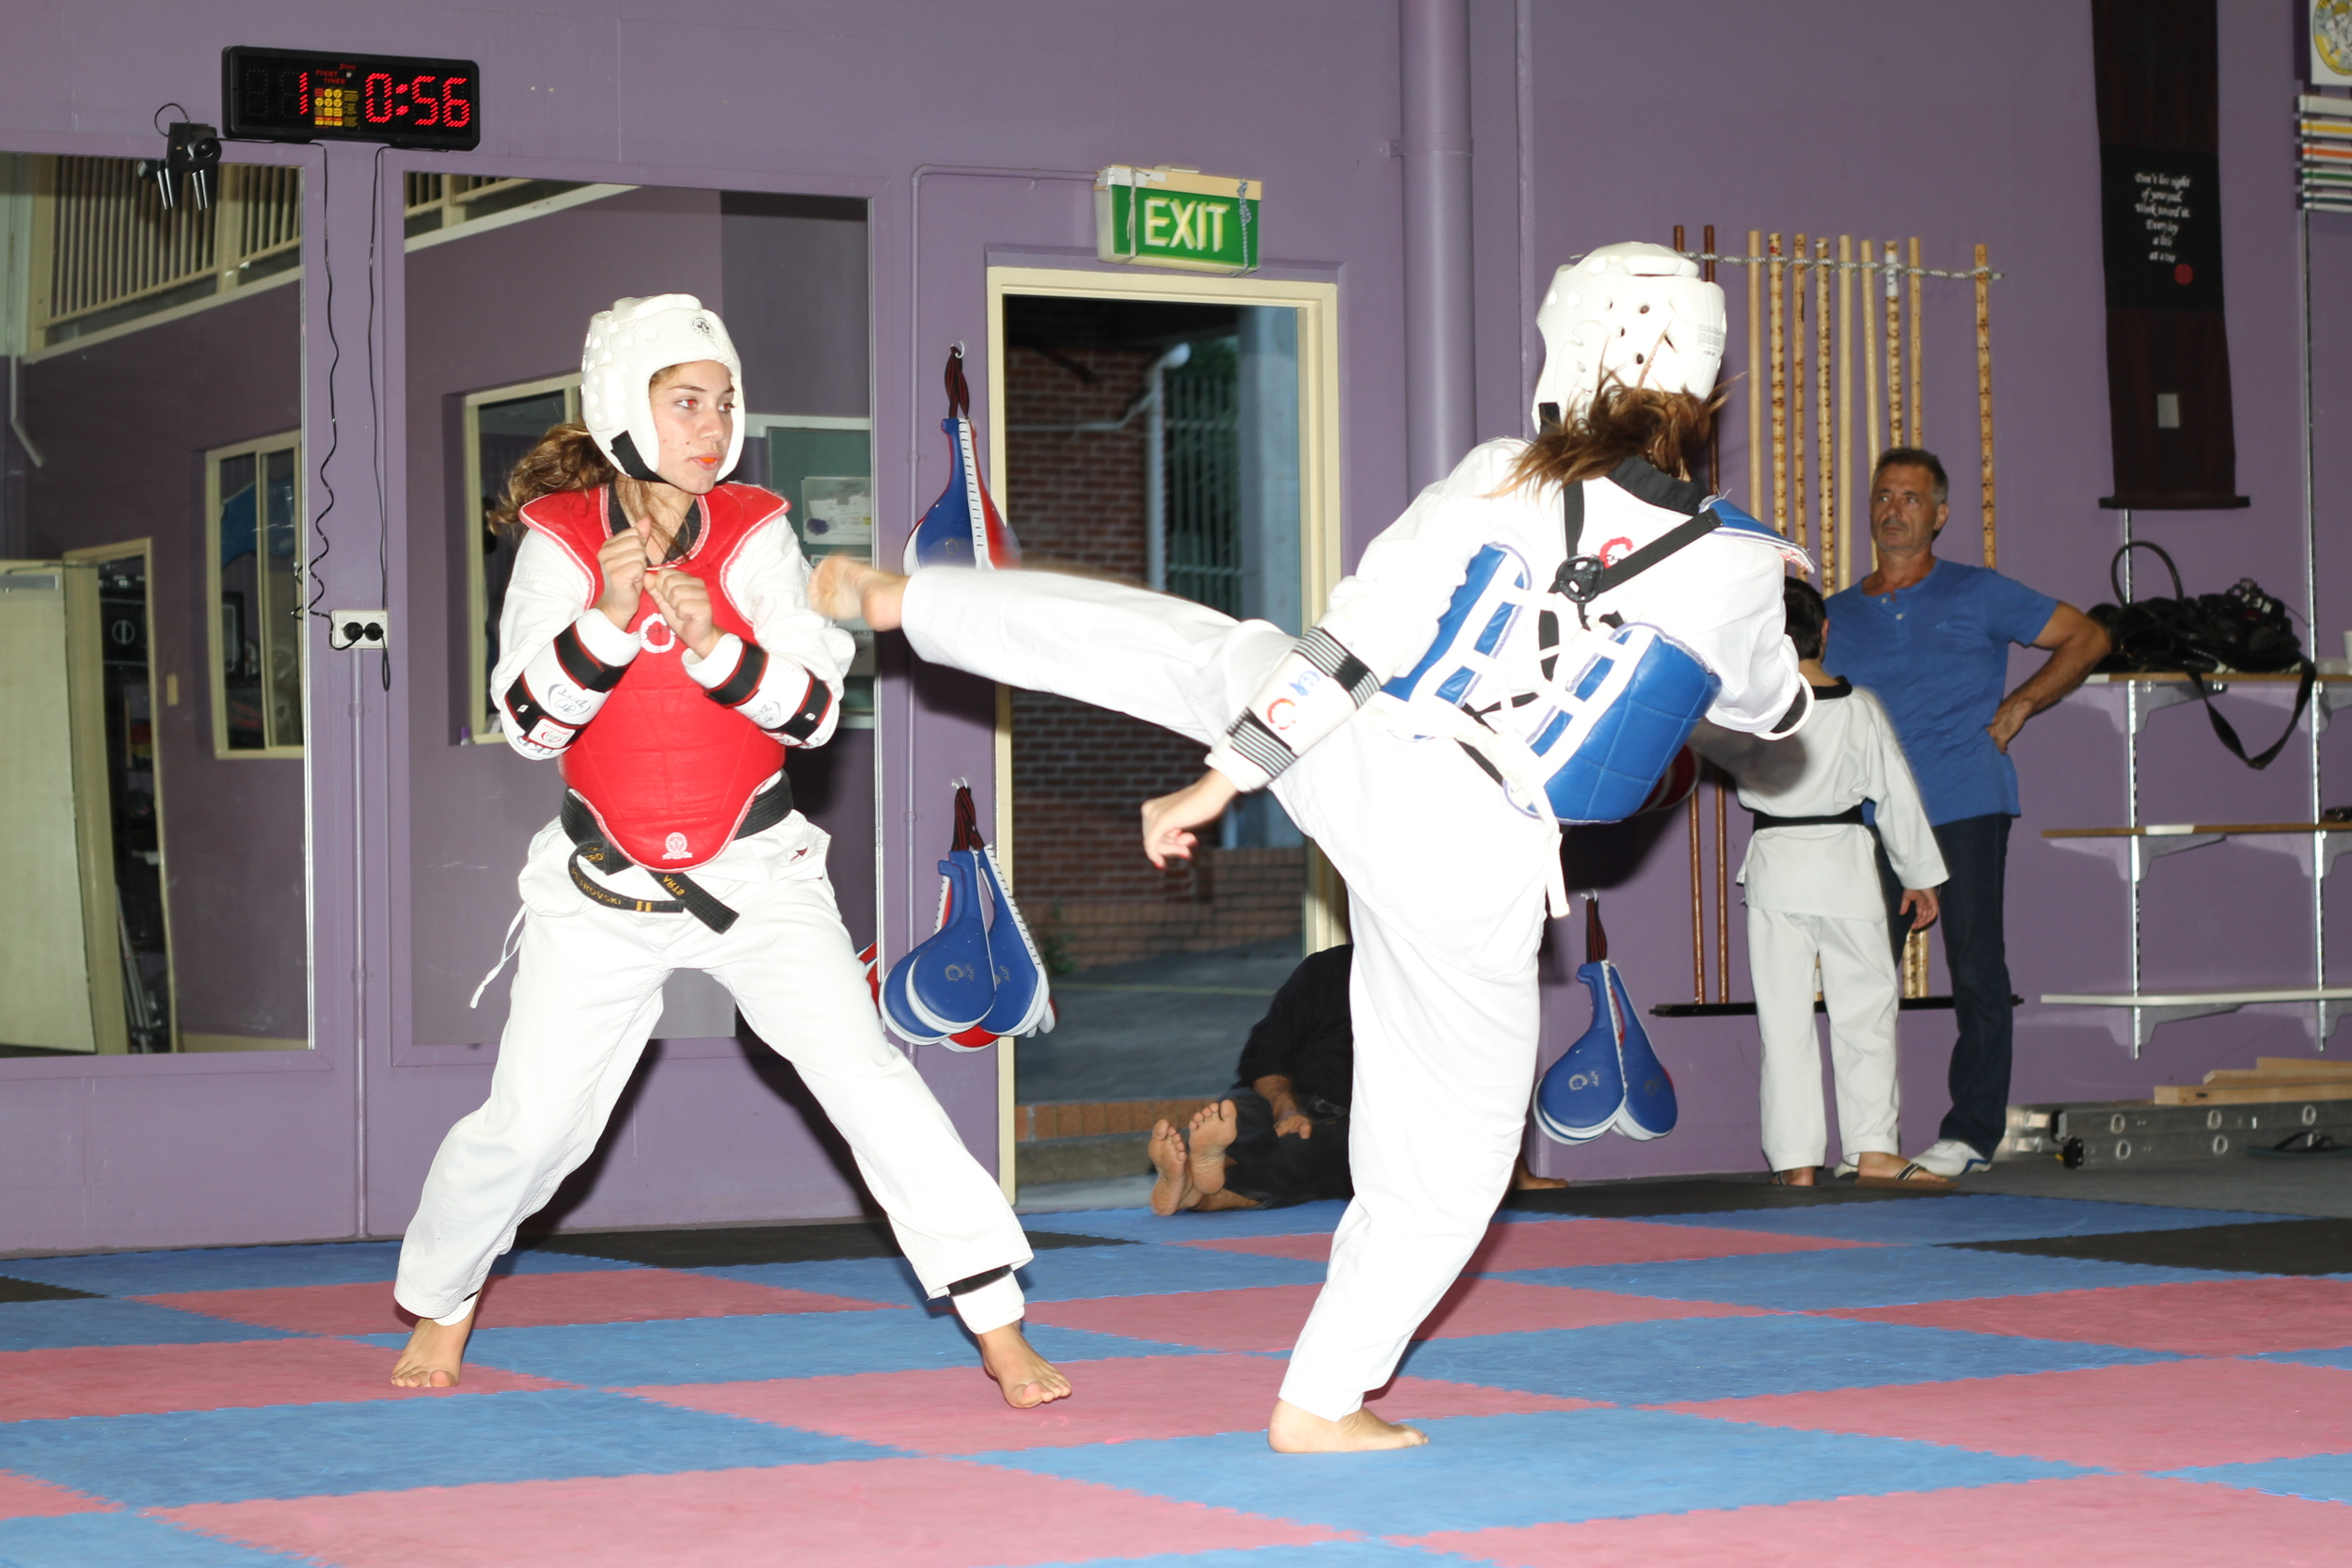 Taekwondo|Martial Arts|Brazilian Jiu-Jitsu|BJJ|Karate